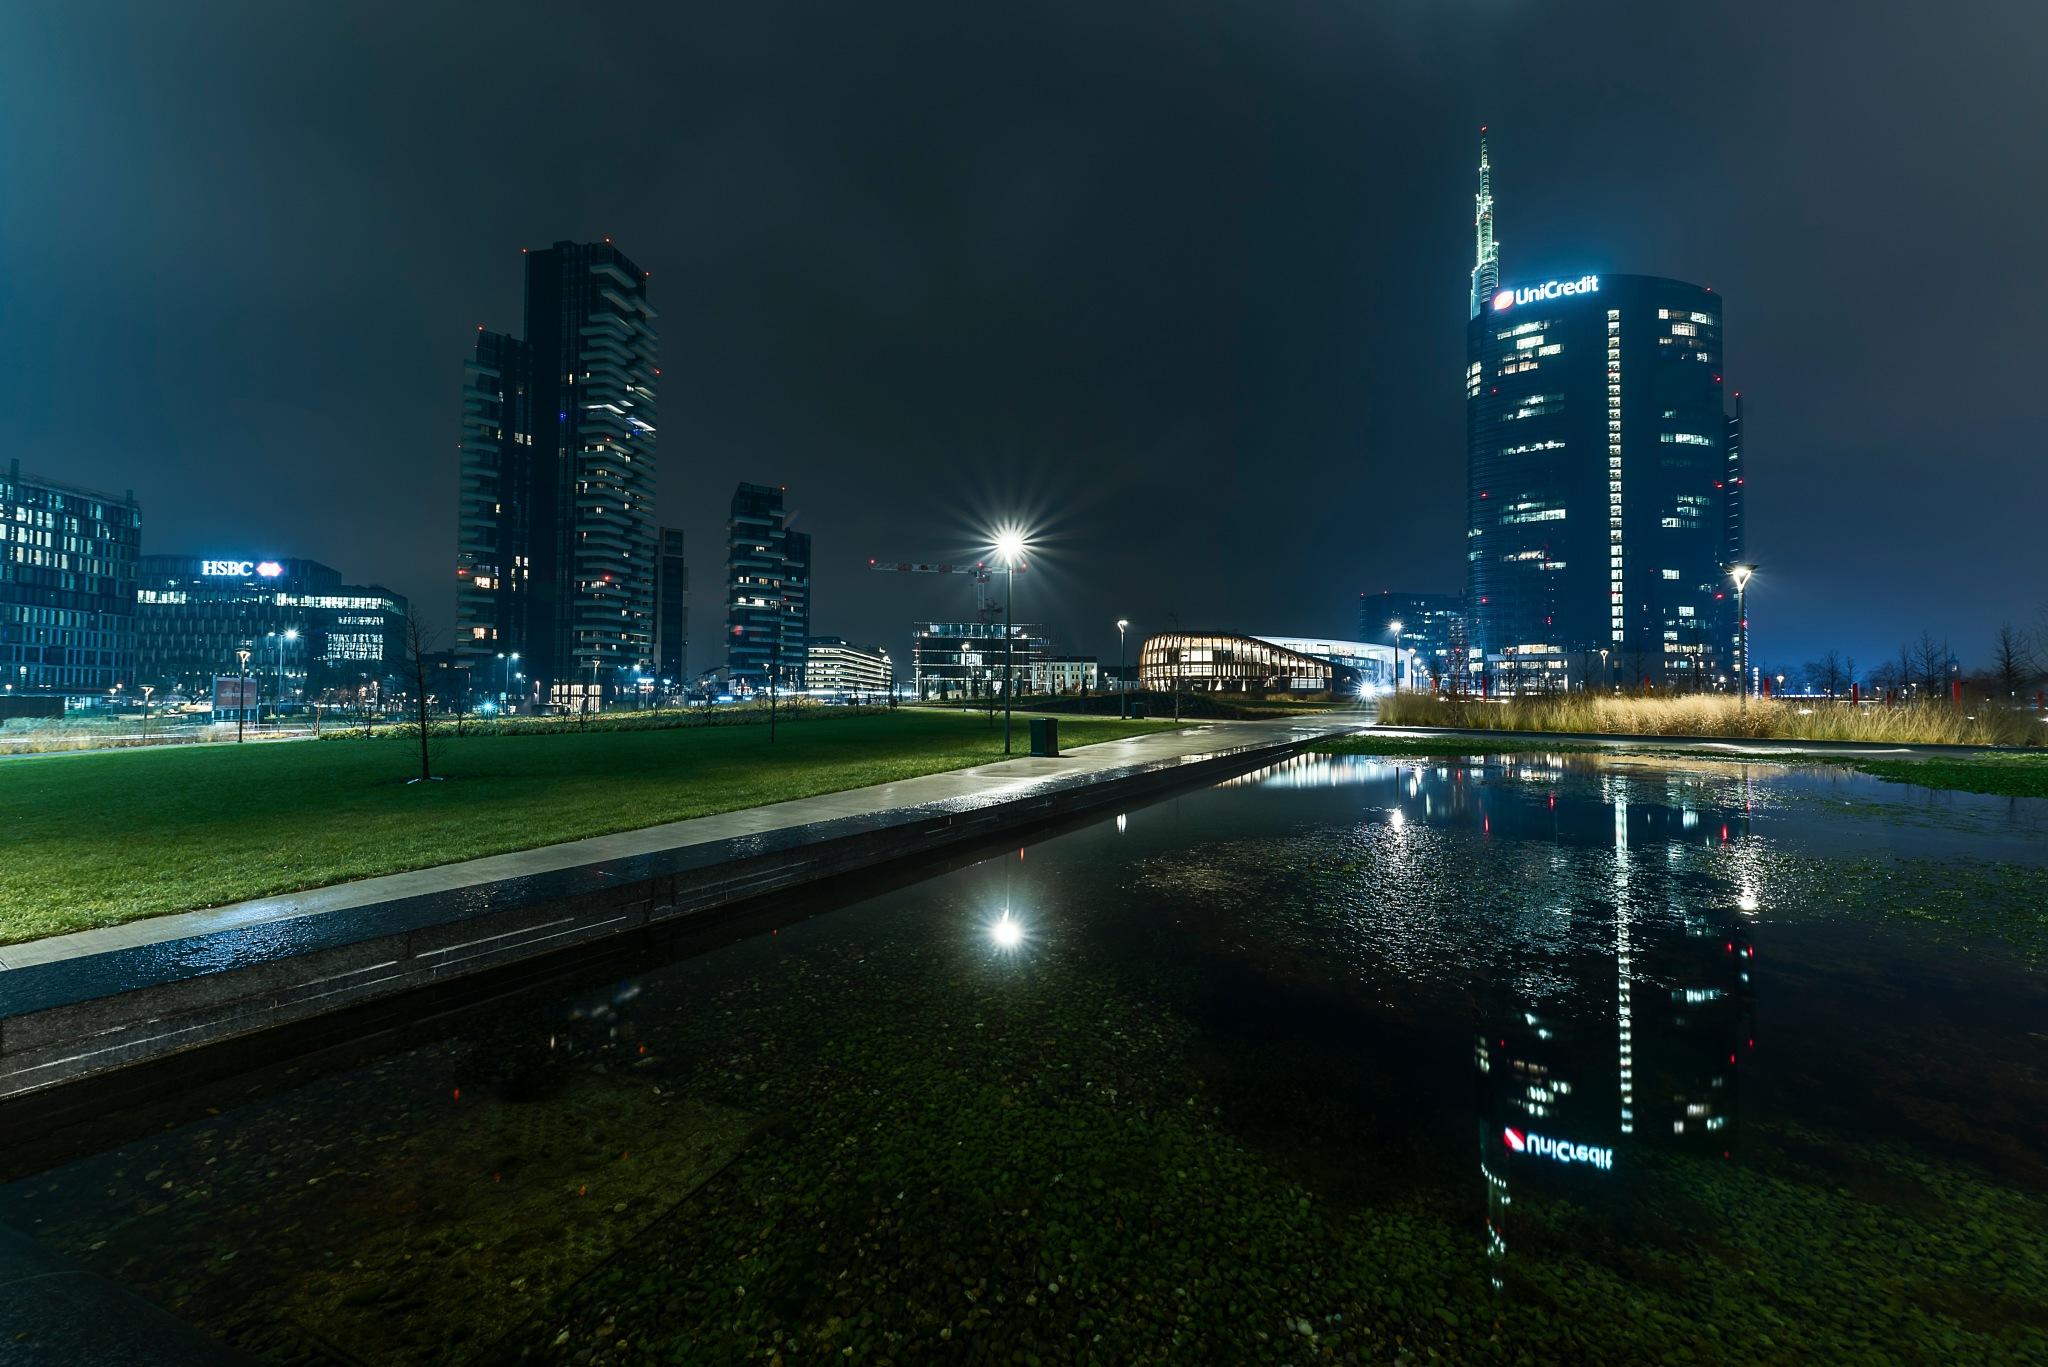 City lights by Mauro De Vita